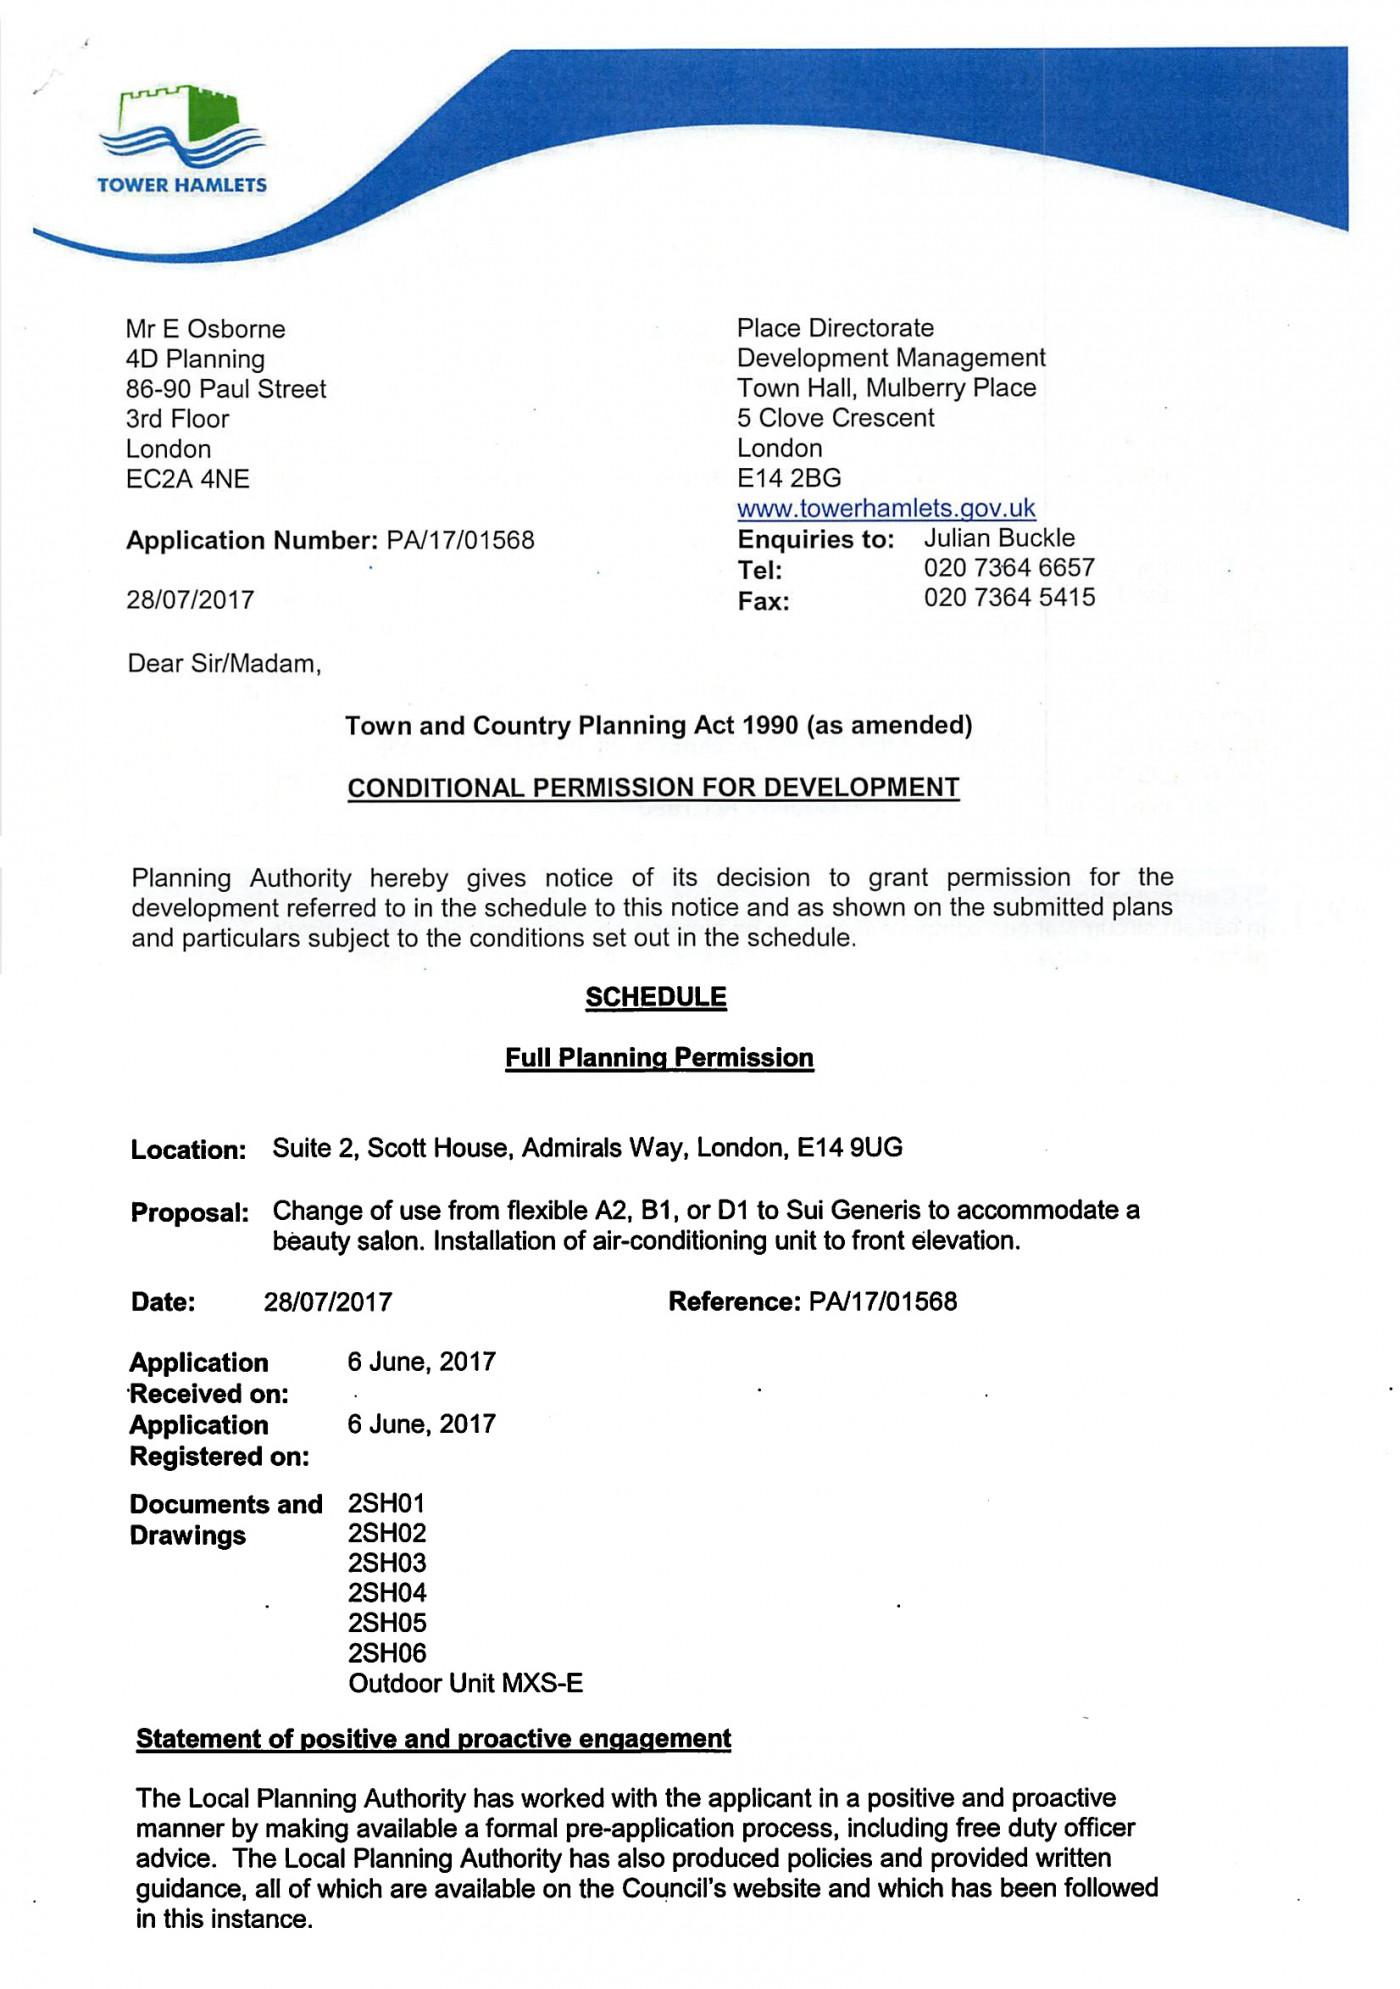 decision notice - Tower Hamlets Council